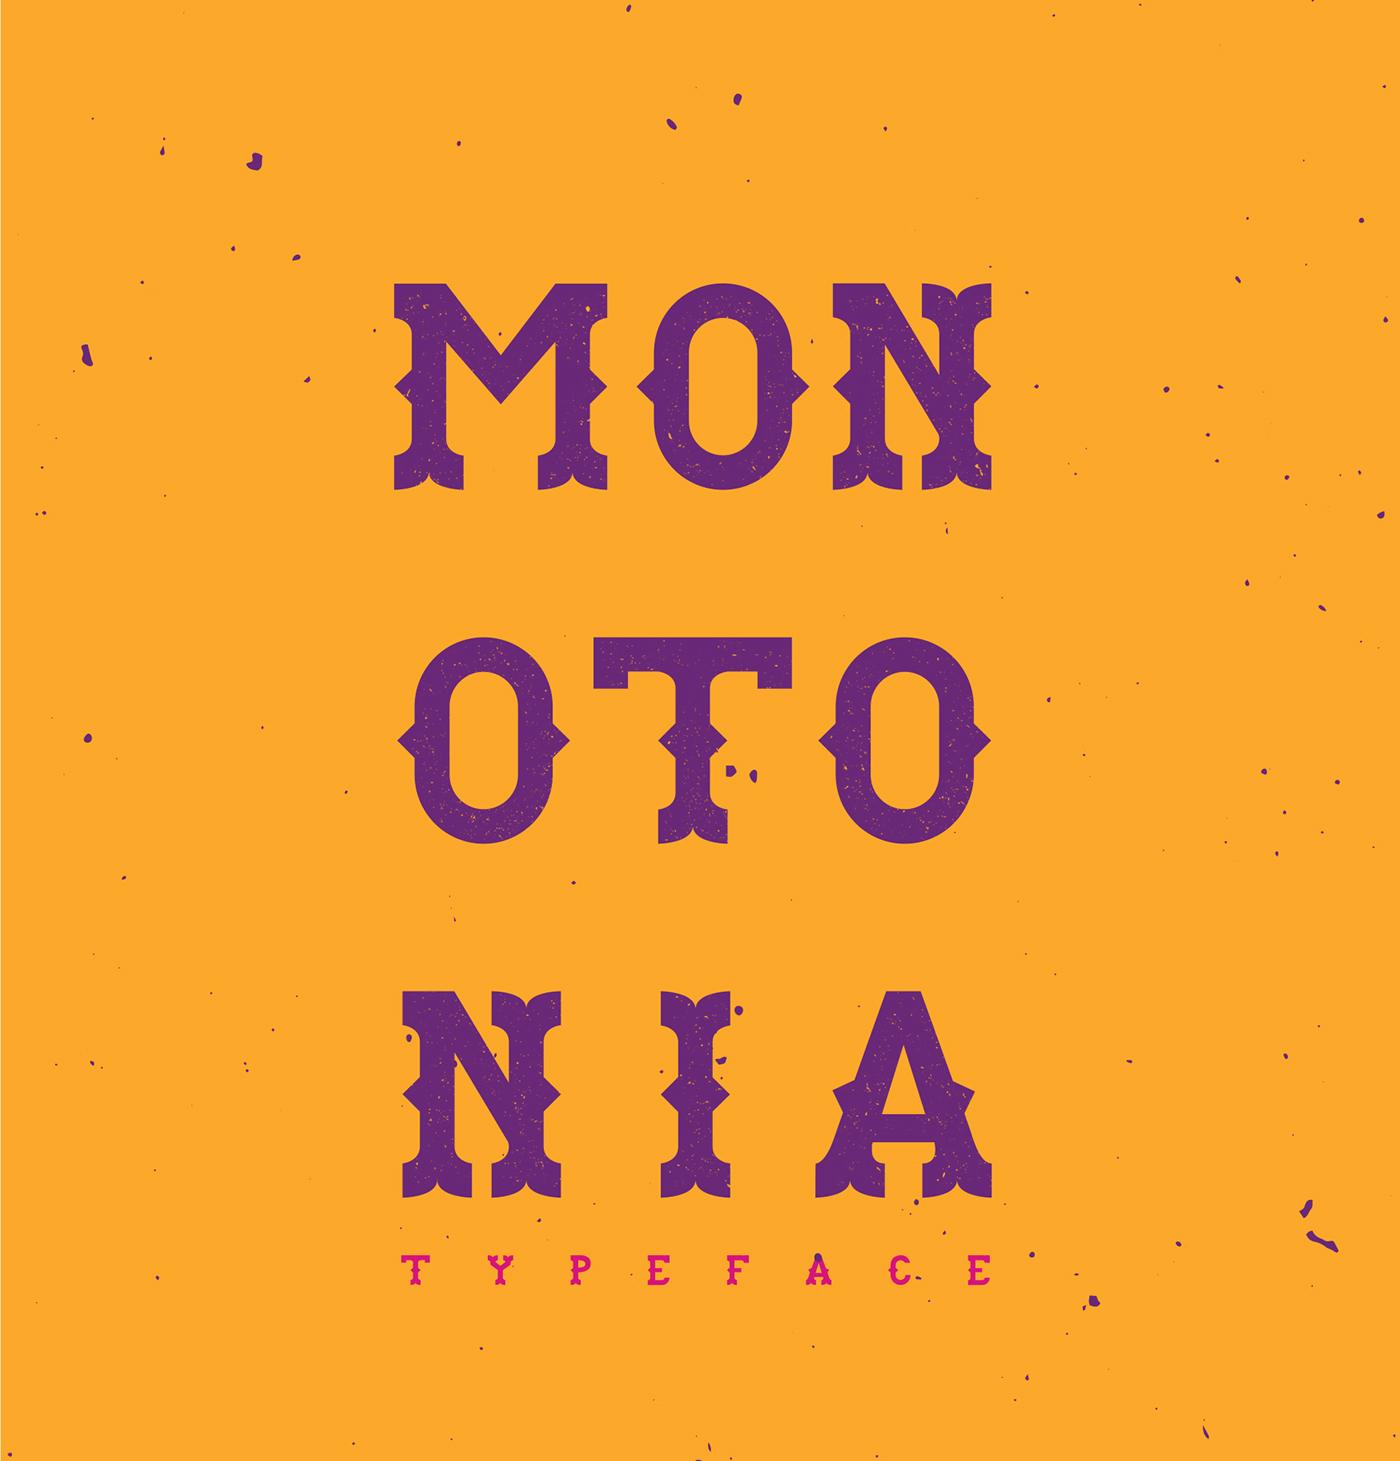 Free Download: Monotonia Typeface